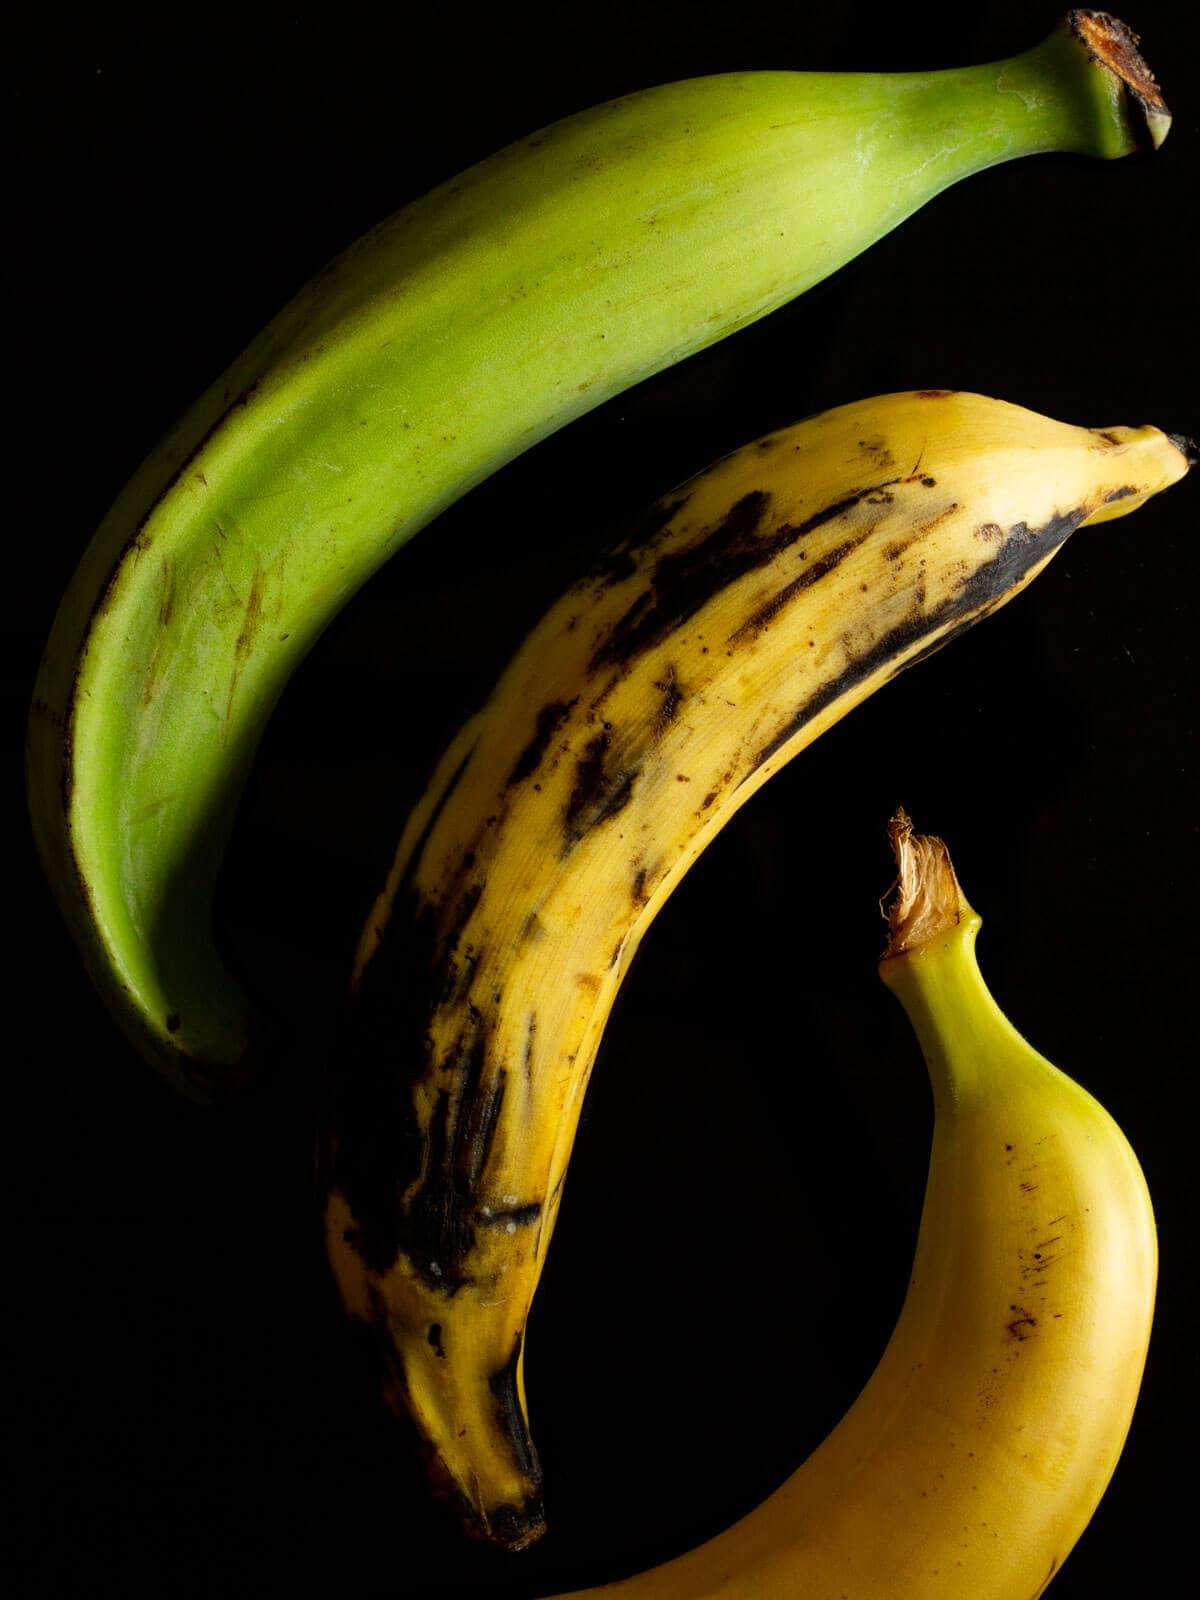 green plantains, ripe plantains and bananas comparison